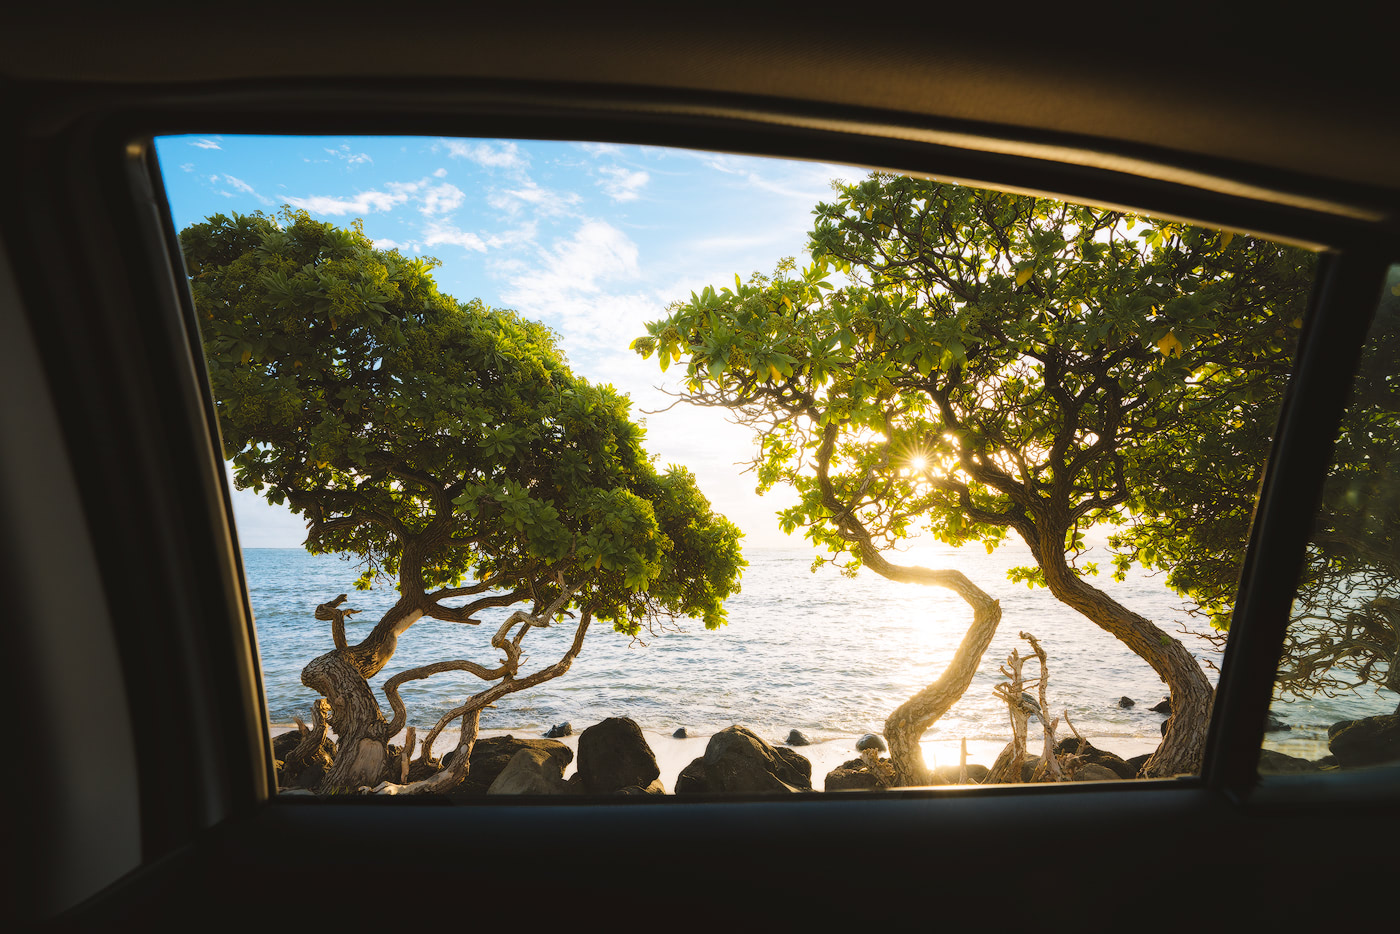 5 Best Things To Do On Oahu Renee Roaming Uber Backseat View 1